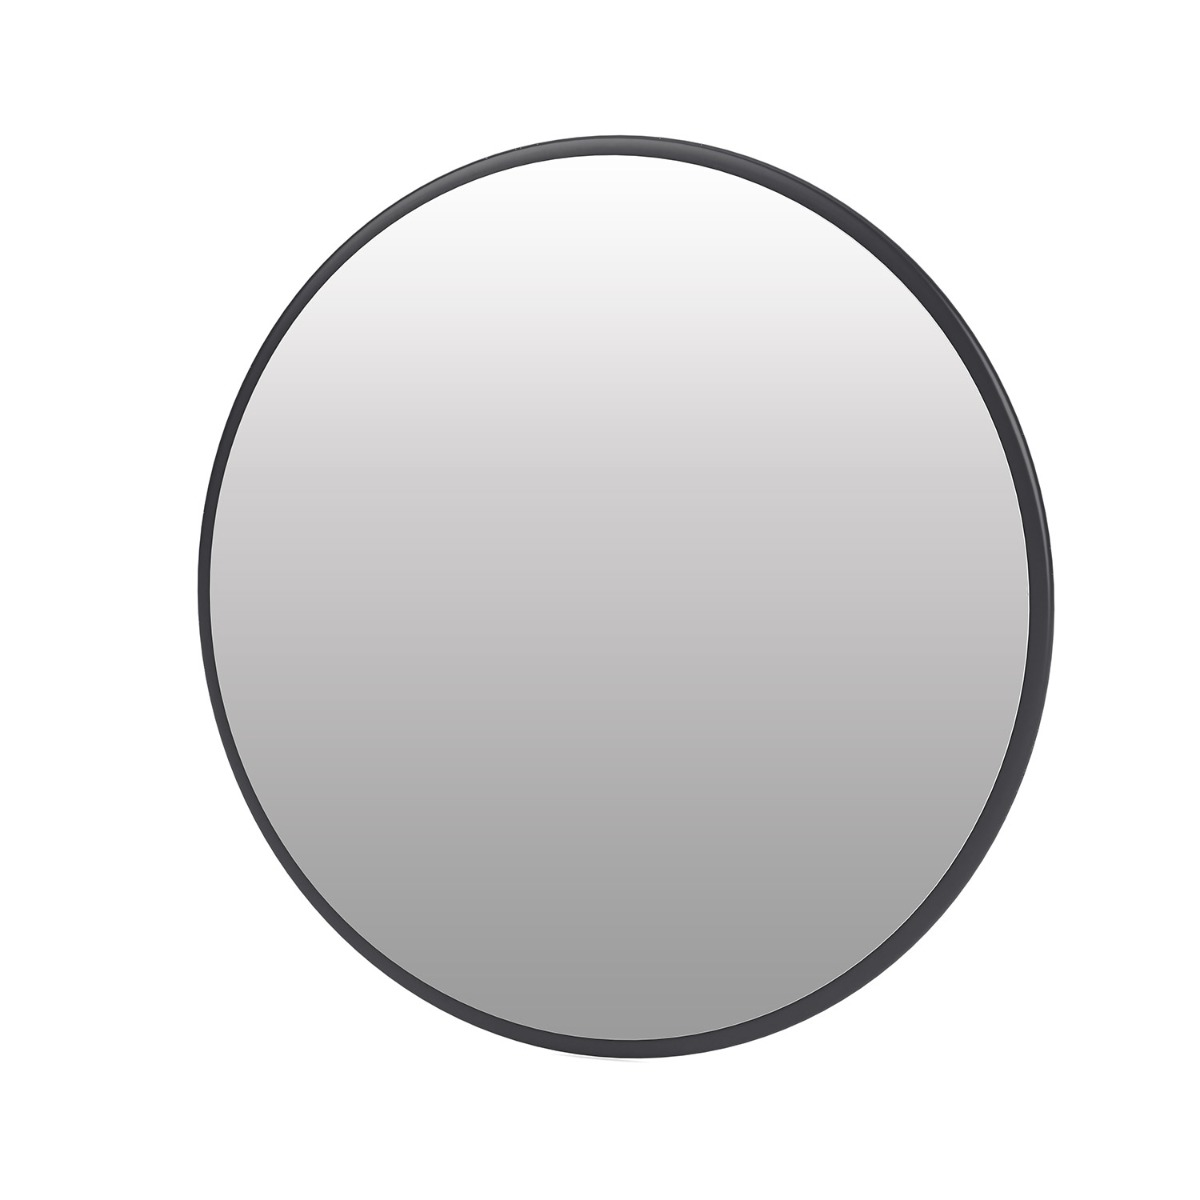 Montana Mini Spegel Rund 35 cm Anthracite